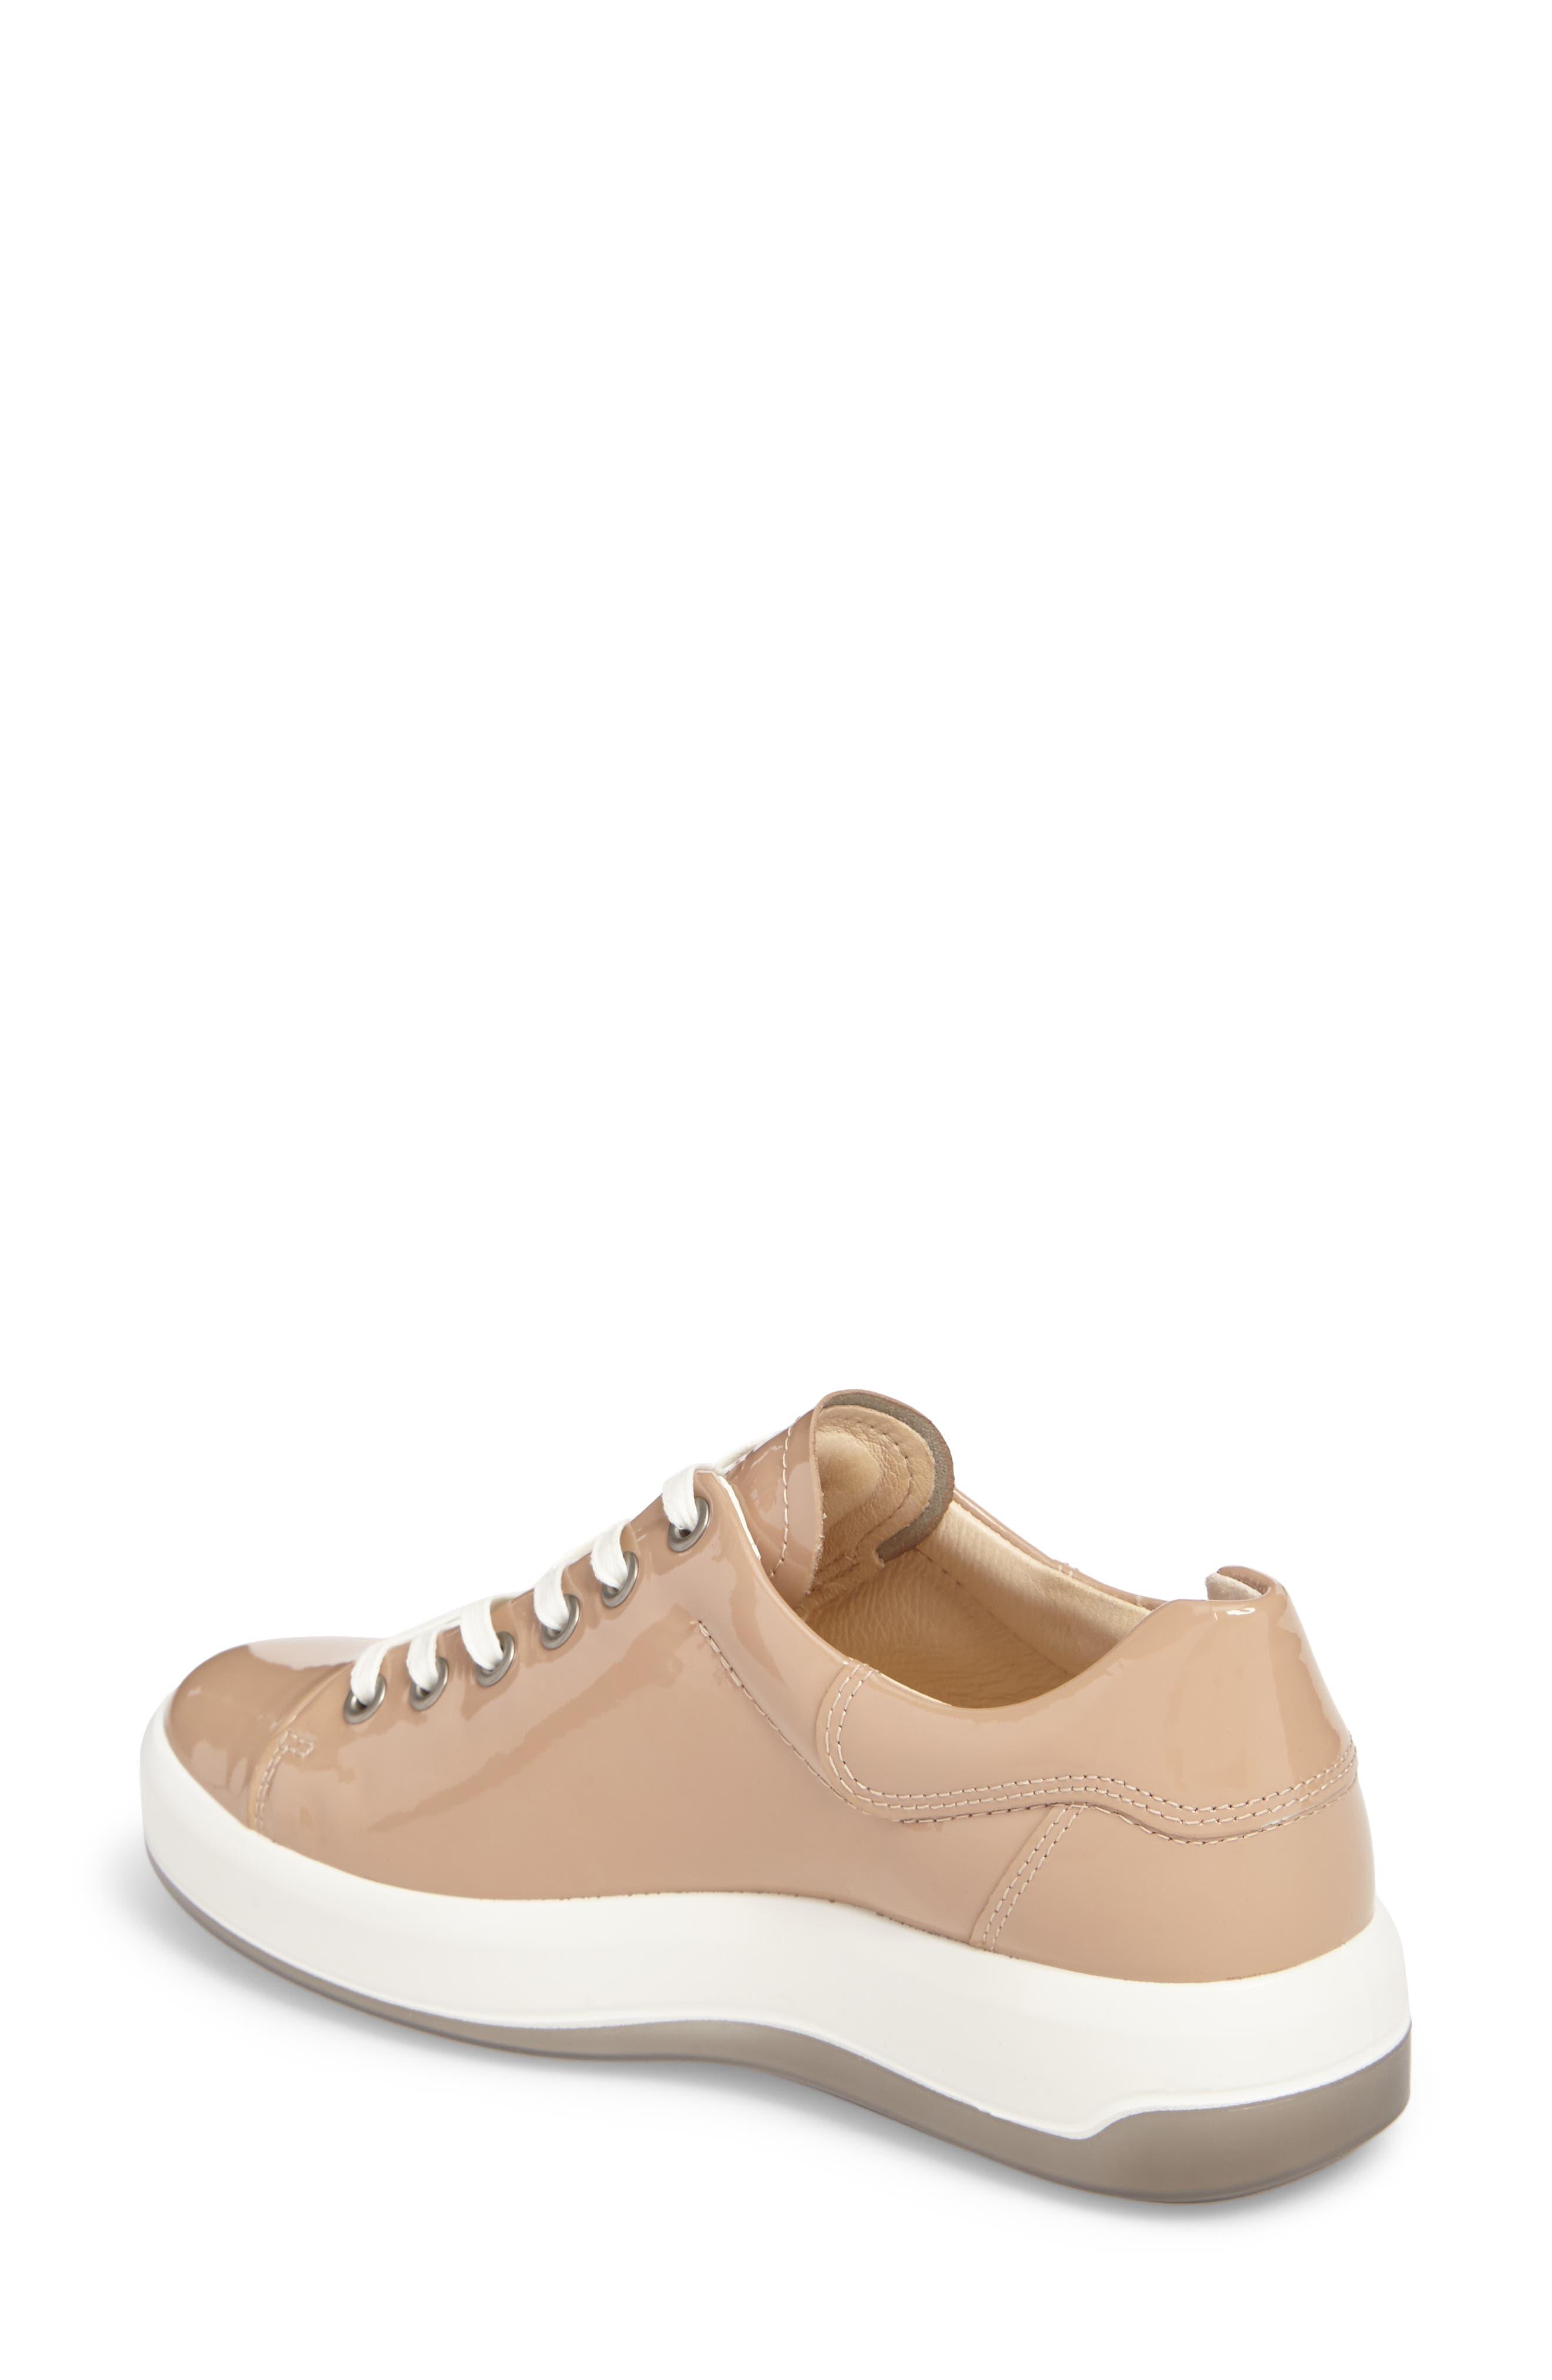 Soft 9 Sneaker,                             Alternate thumbnail 2, color,                             Ginger Leather